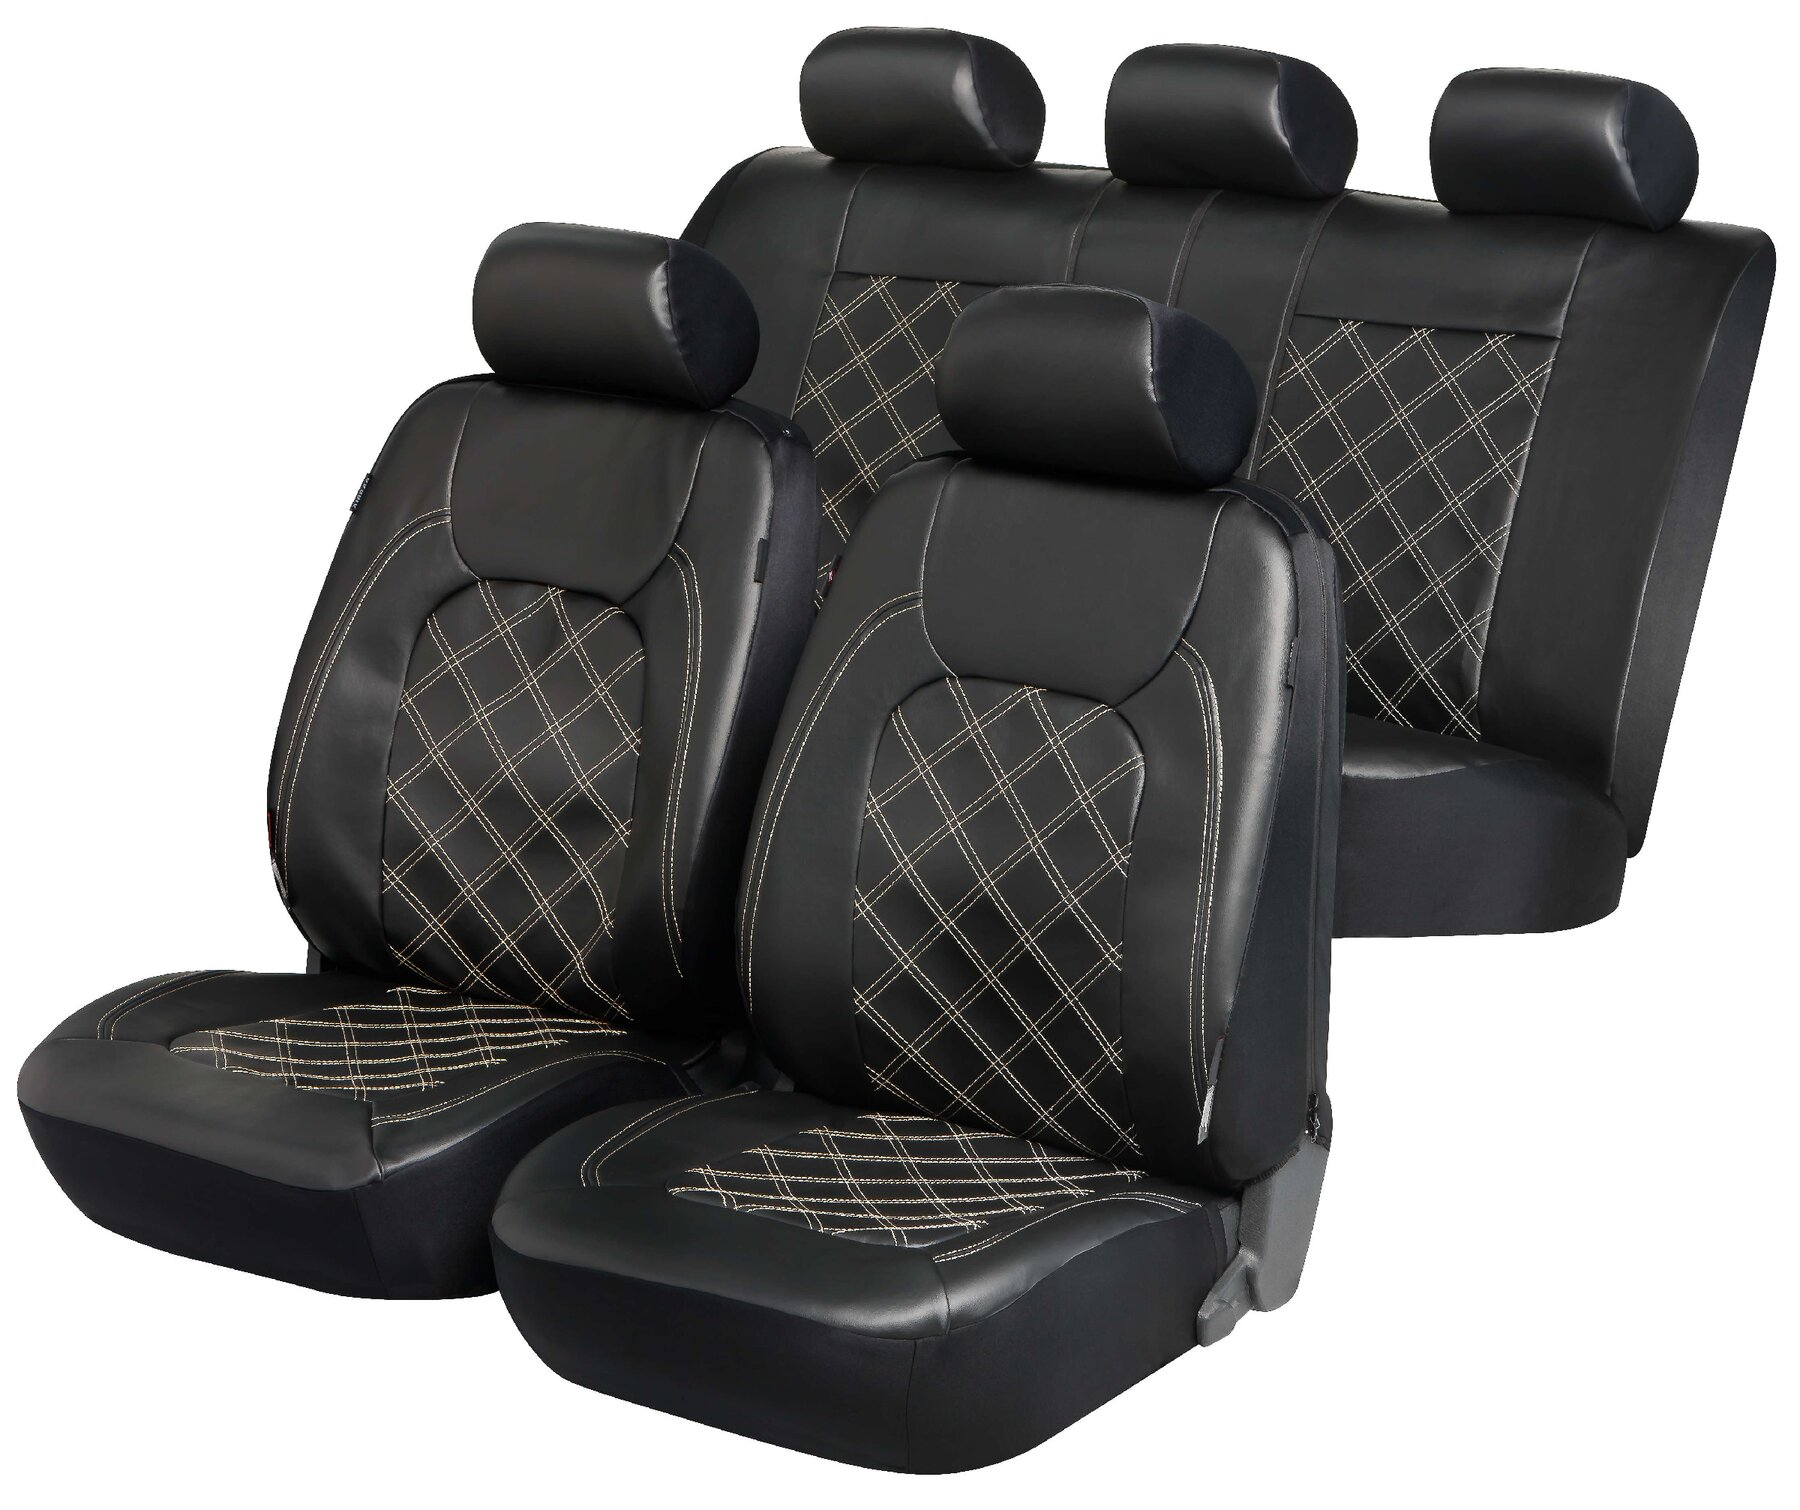 zipp it deluxe paddington auto sitzbez ge aus kunstleder mit reissverschluss system kunstleder. Black Bedroom Furniture Sets. Home Design Ideas